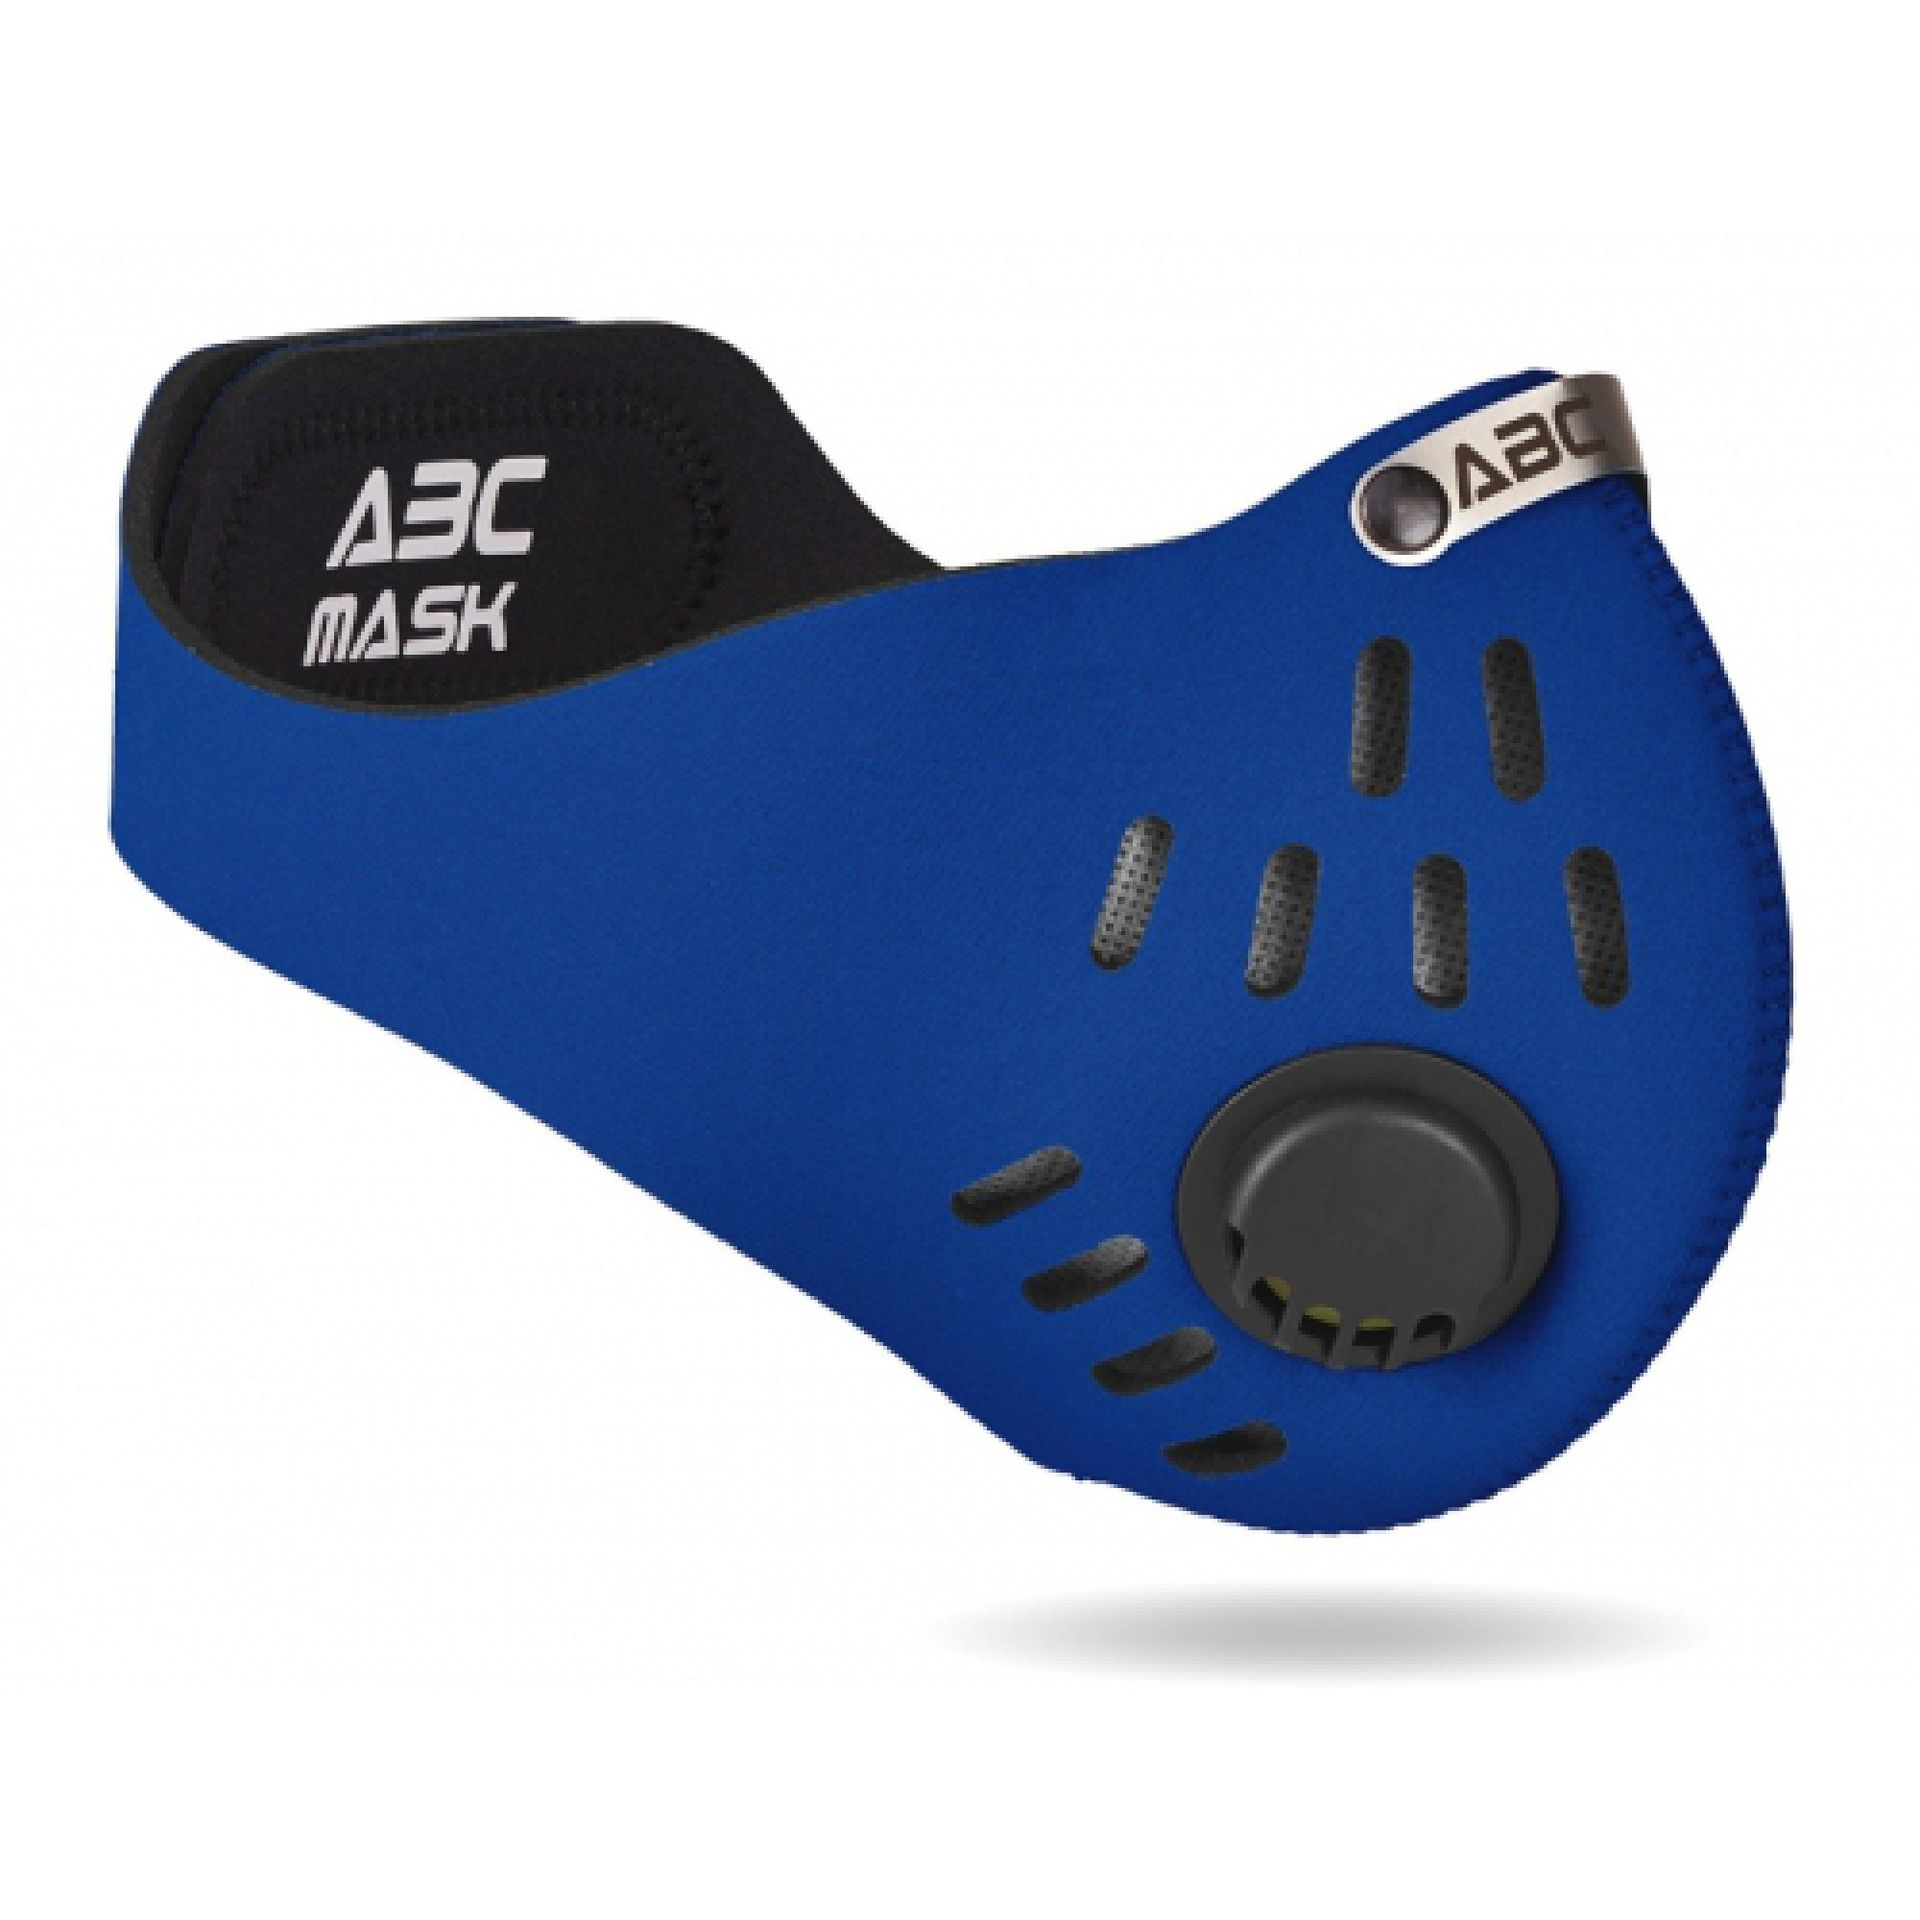 MASKA ANTYSMOGOWA ABC MASKI QUALITY BLUE 1